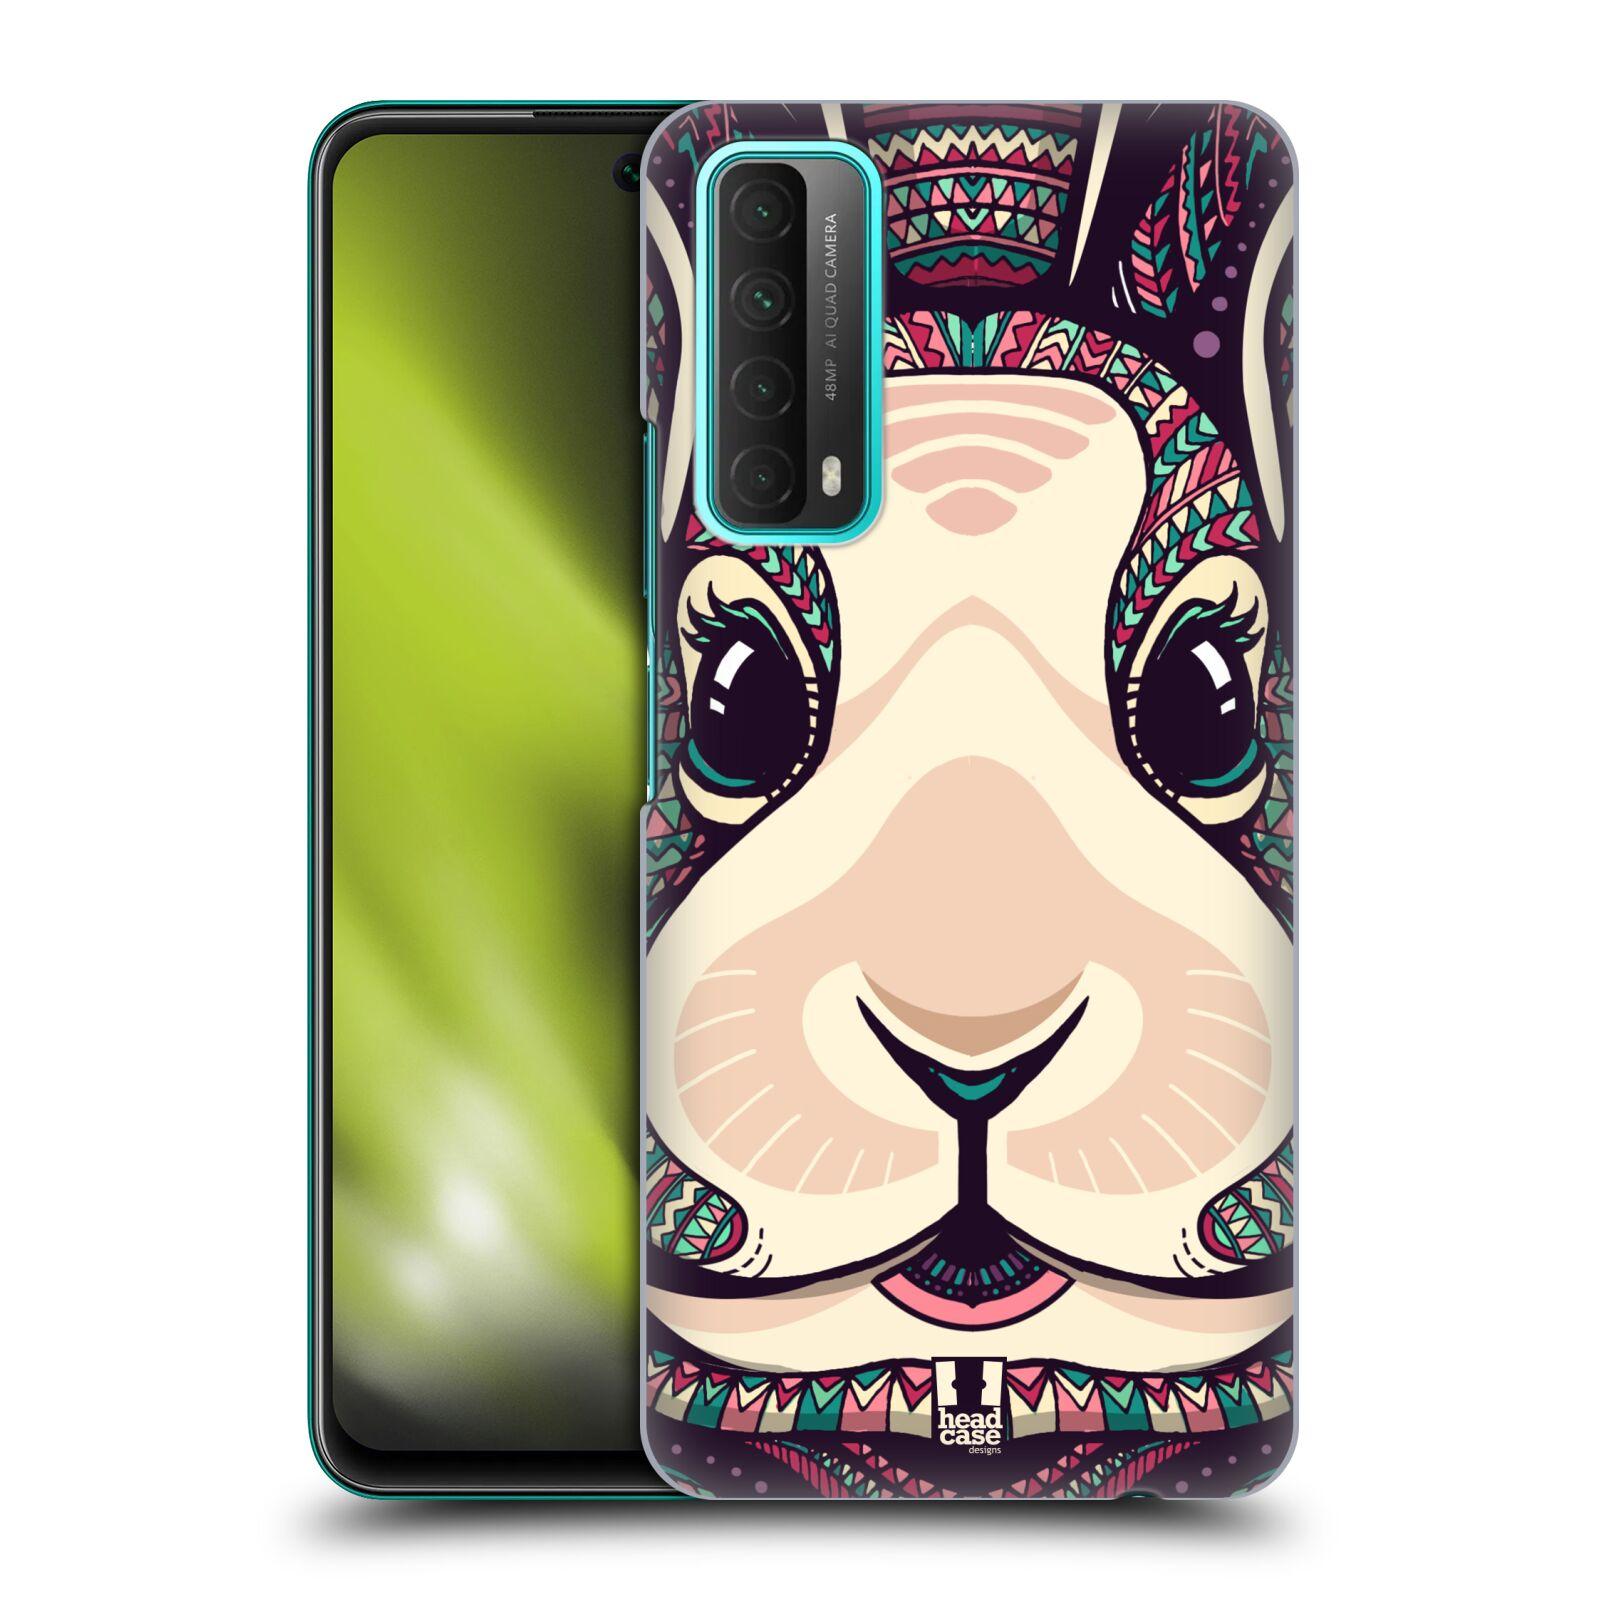 Plastové pouzdro na mobil Huawei P Smart (2021) - Head Case - AZTEC ZAJÍČEK